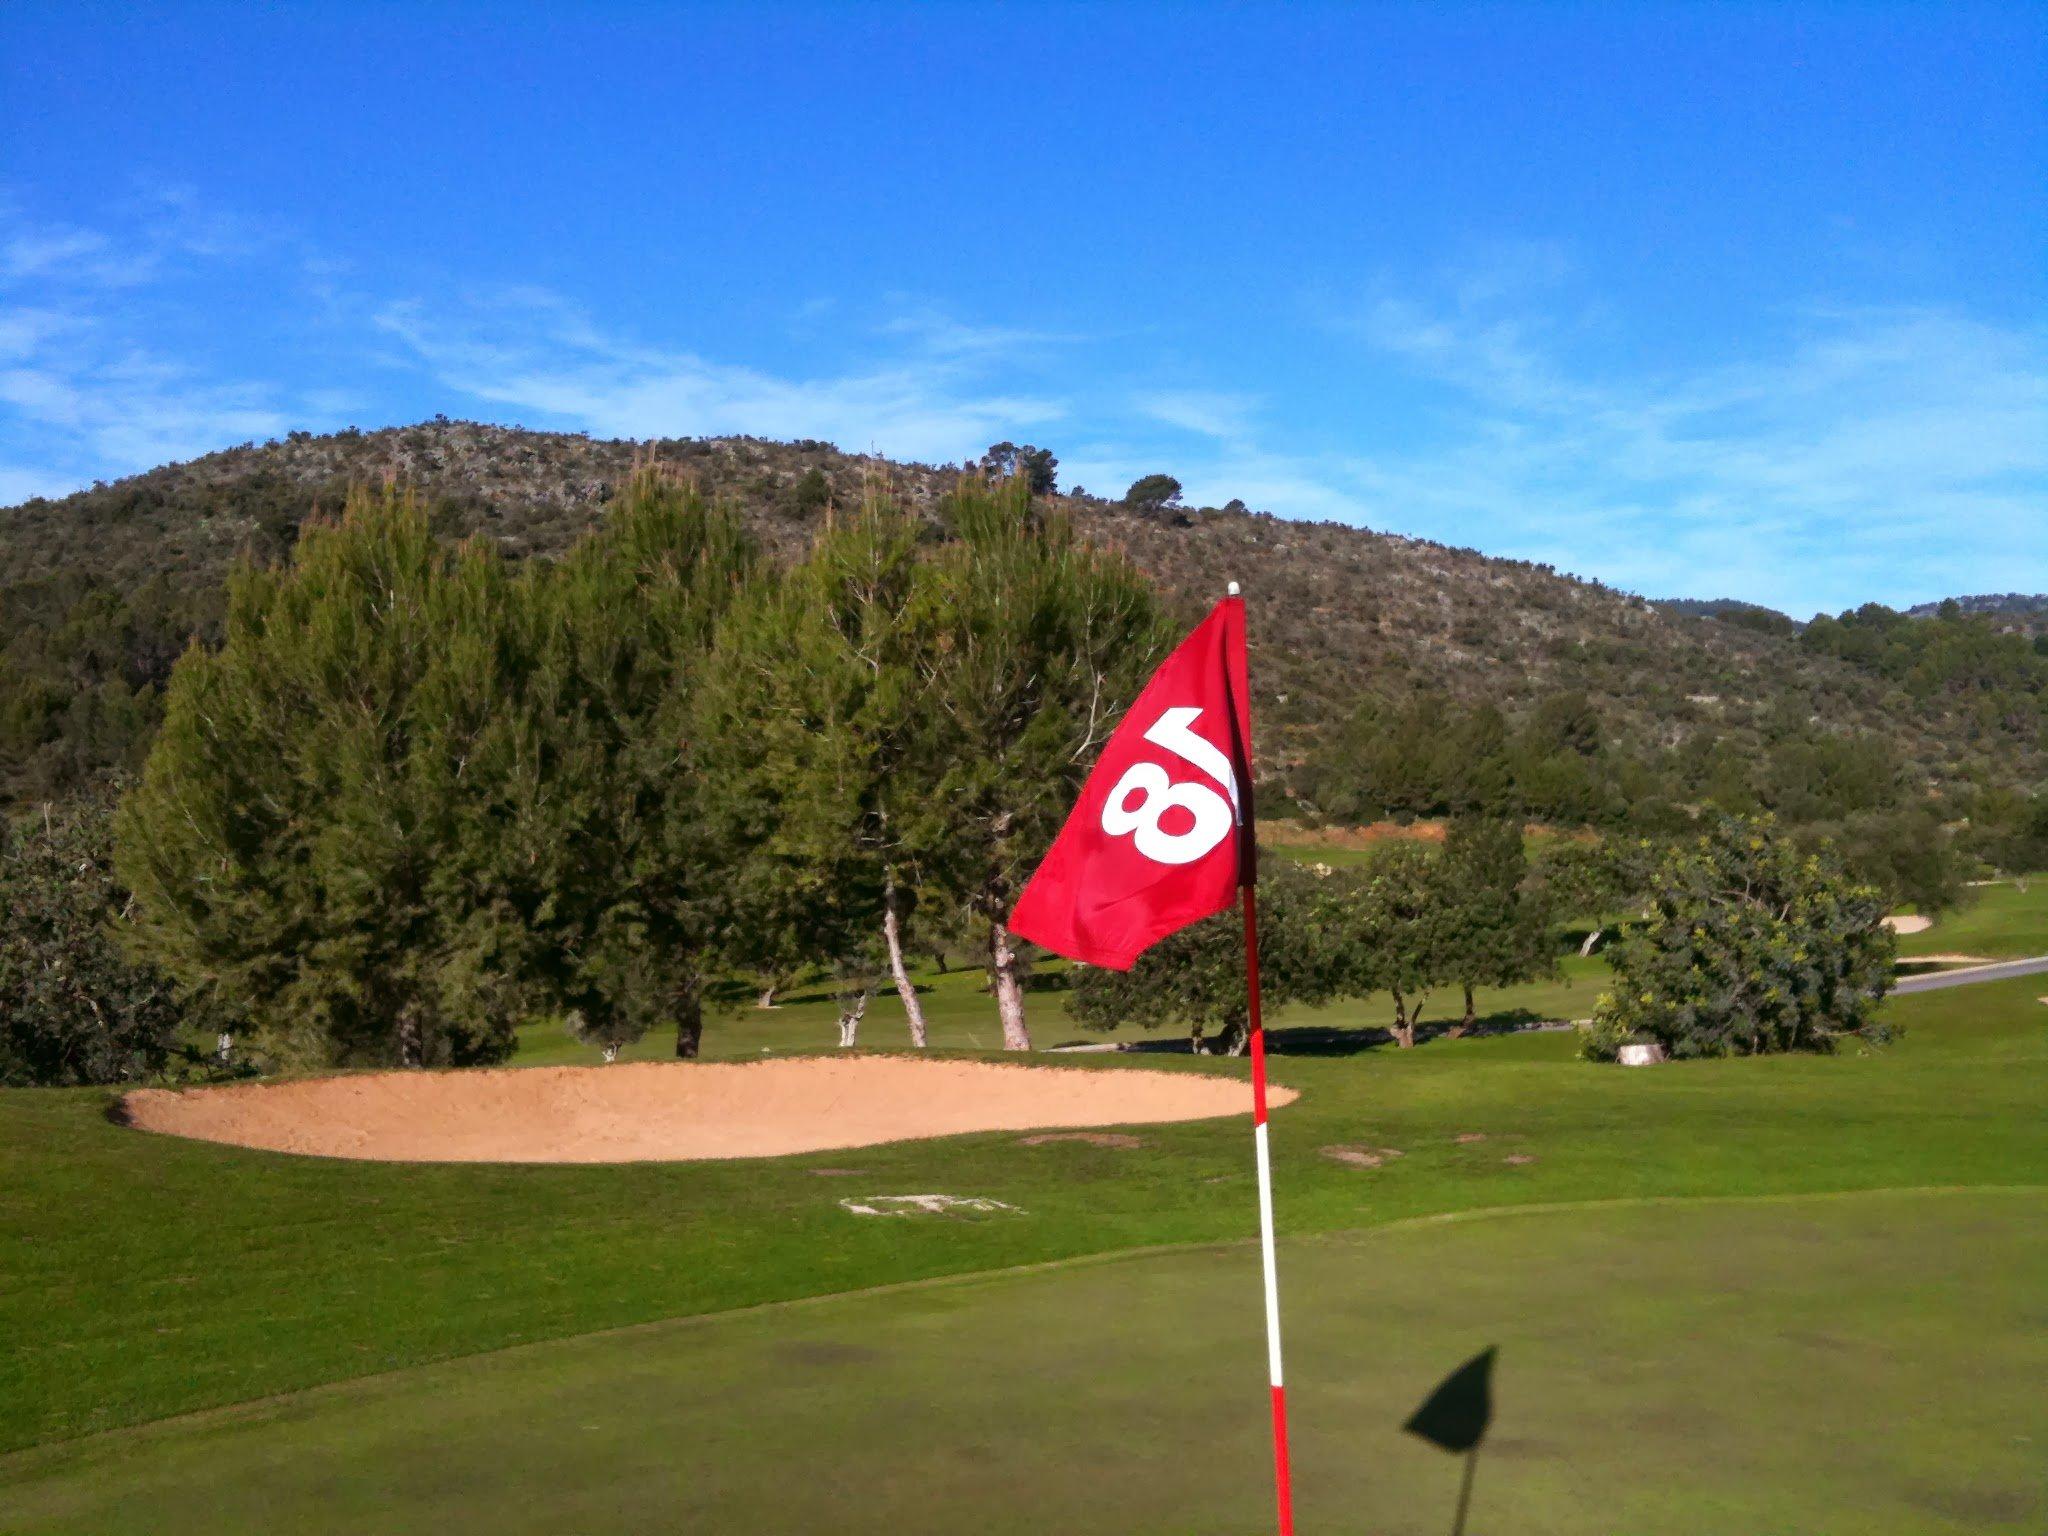 Golfkursanfrage Golfschule Mallorca